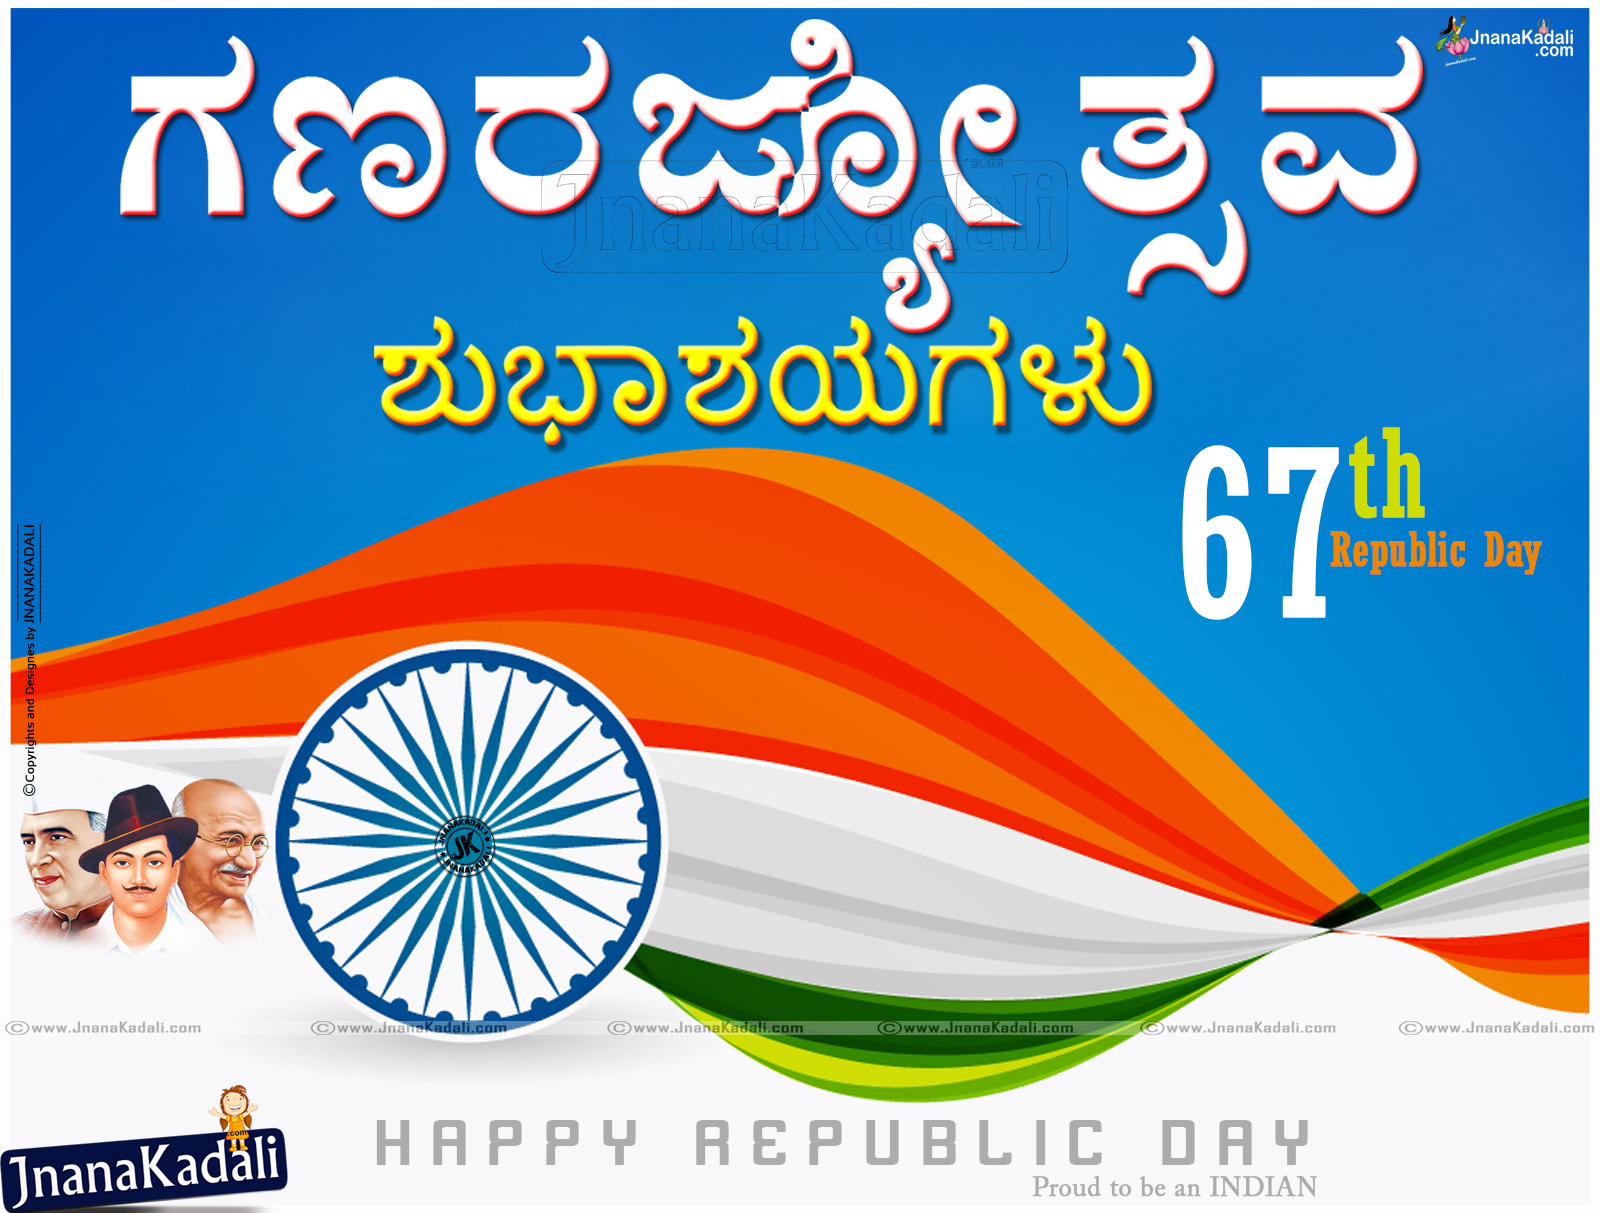 gana rajyotsava kannada republic day quotations jnana kadali com